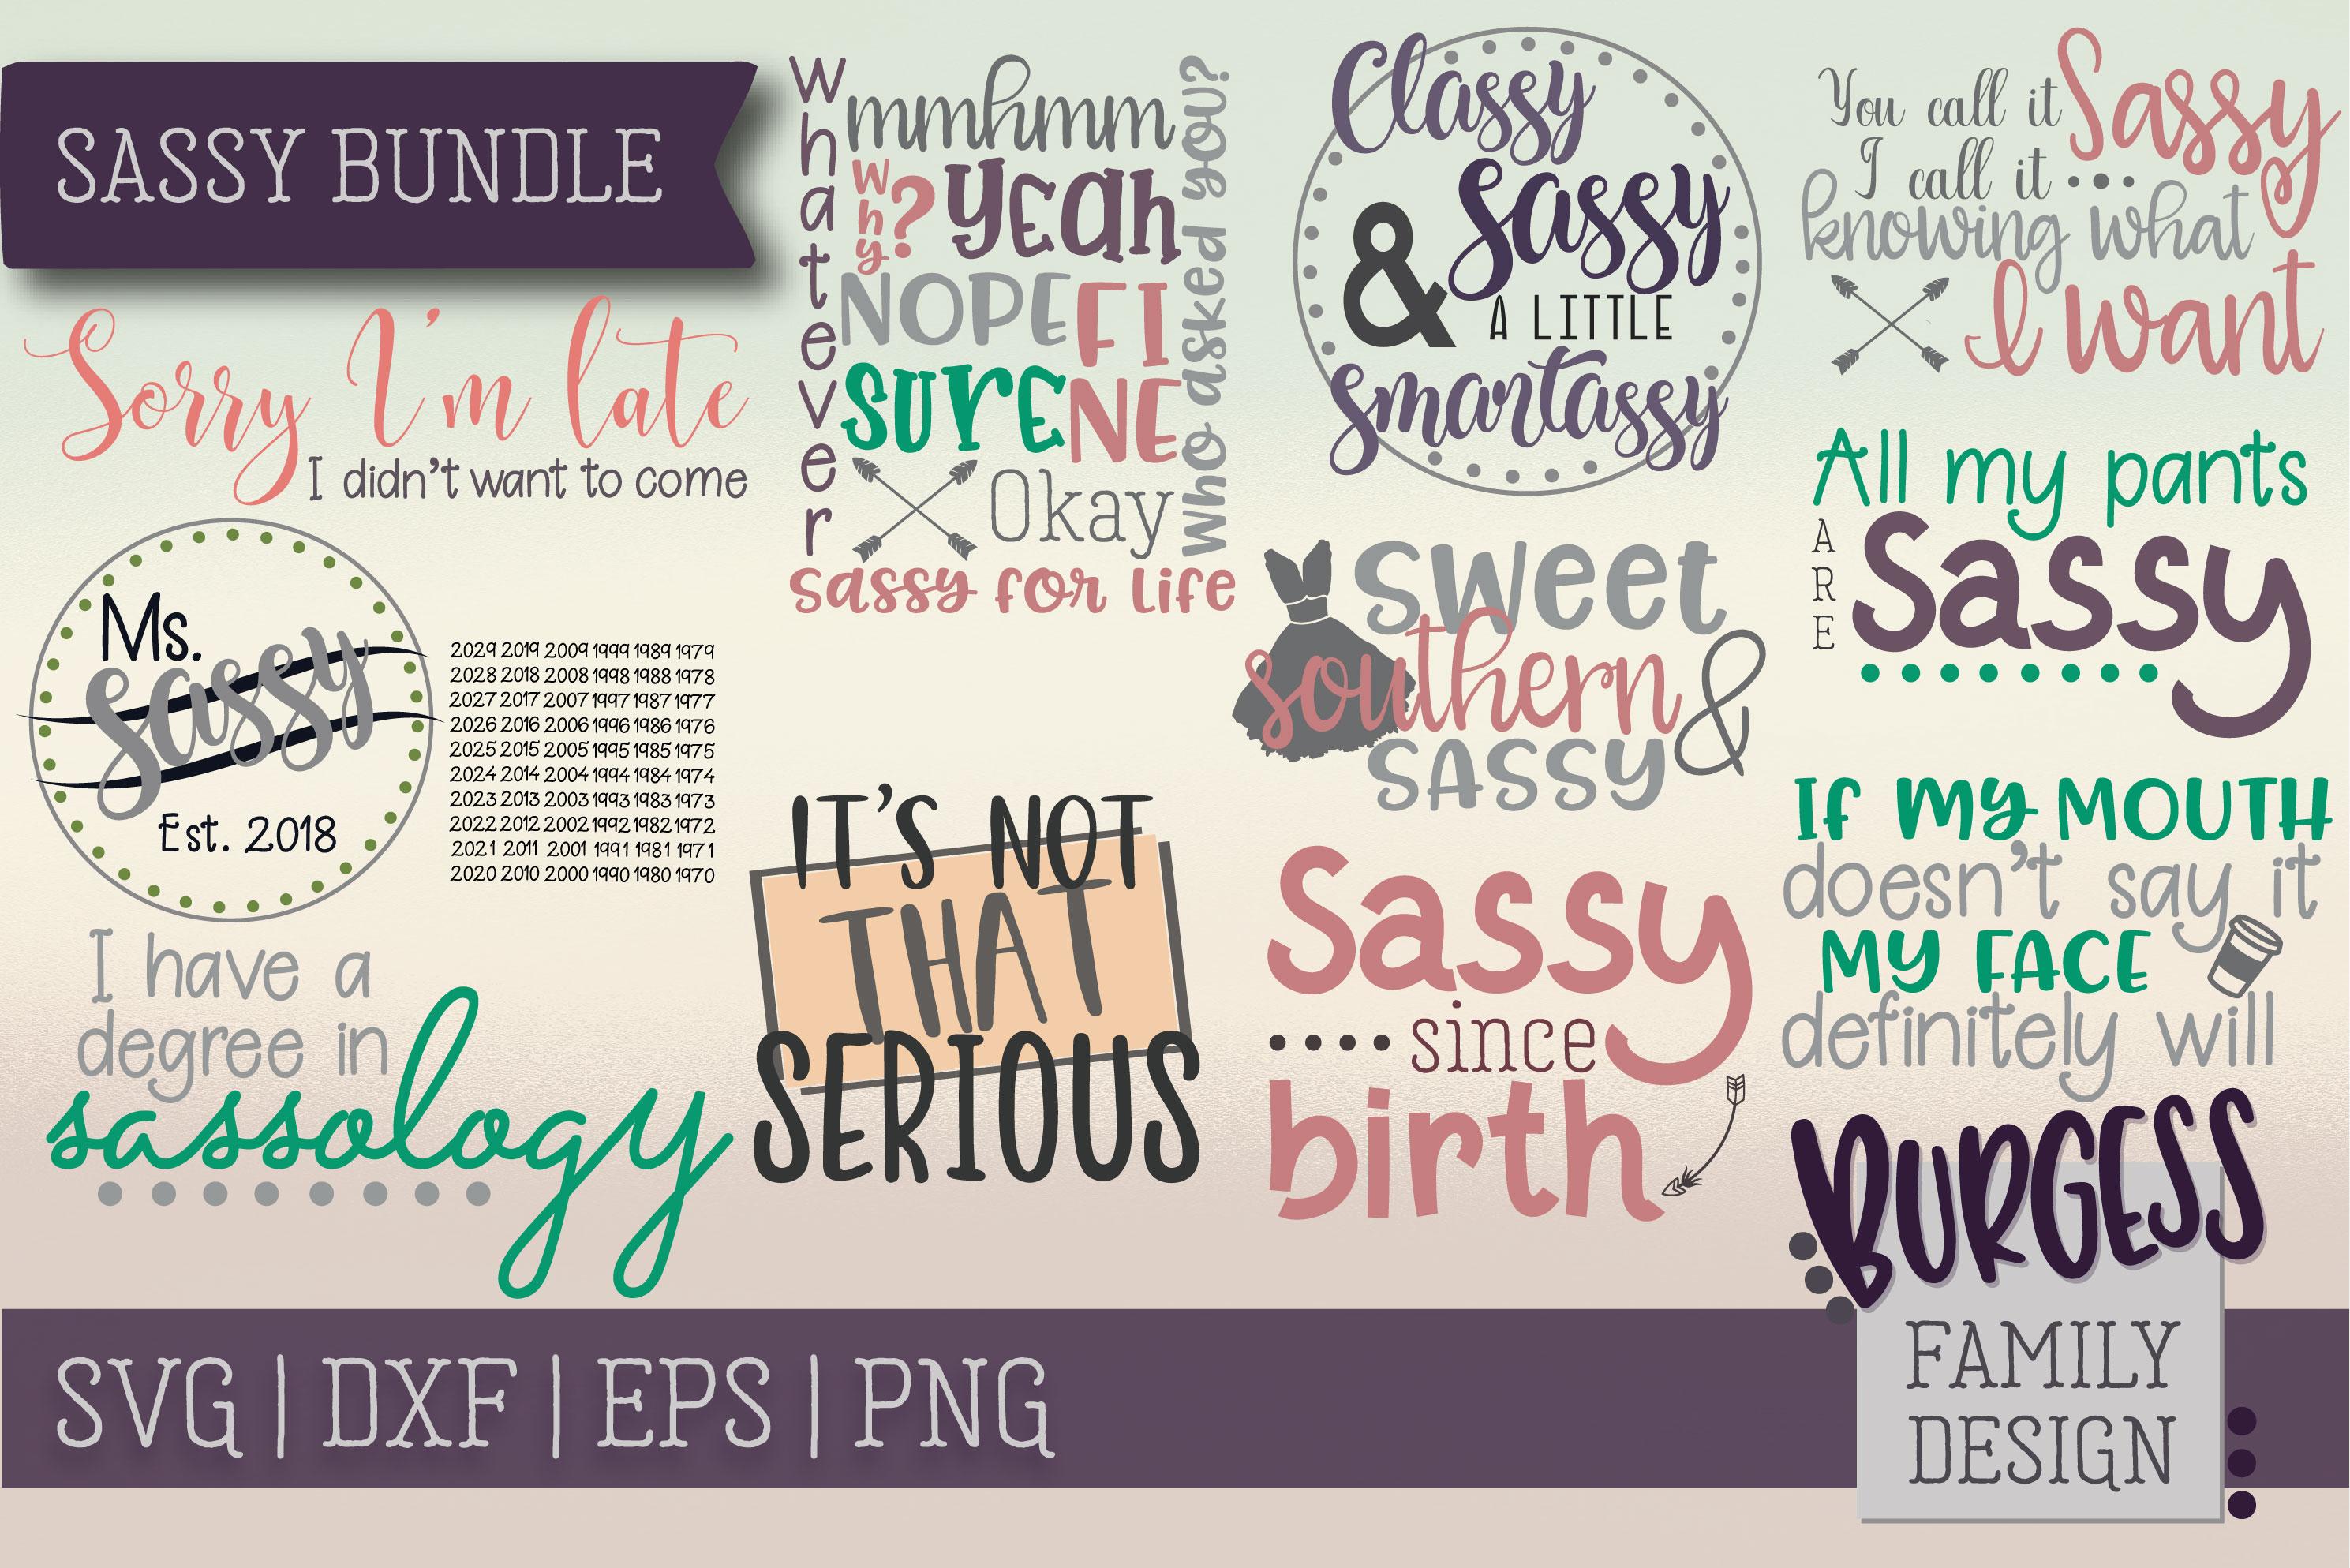 The starter bundle - Over 200 Designs | SVG DXF EPS PNG example image 19